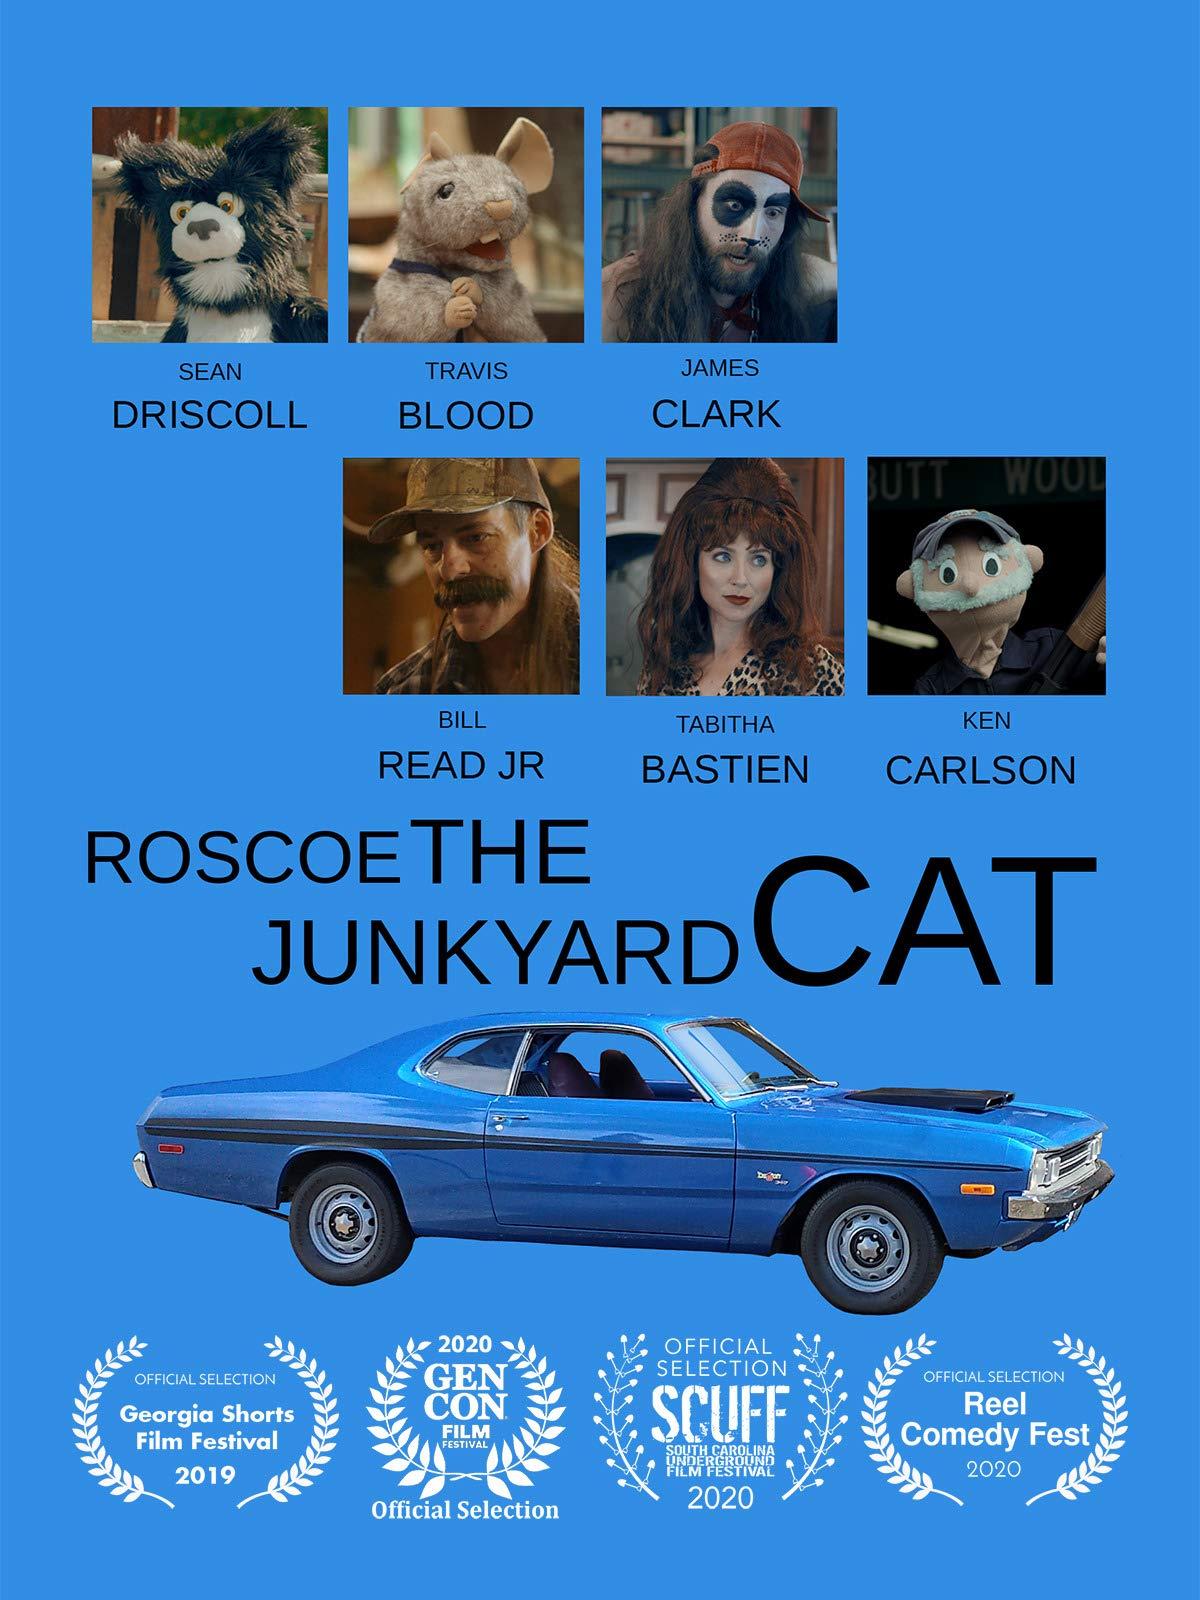 Roscoe the Junkyard Cat